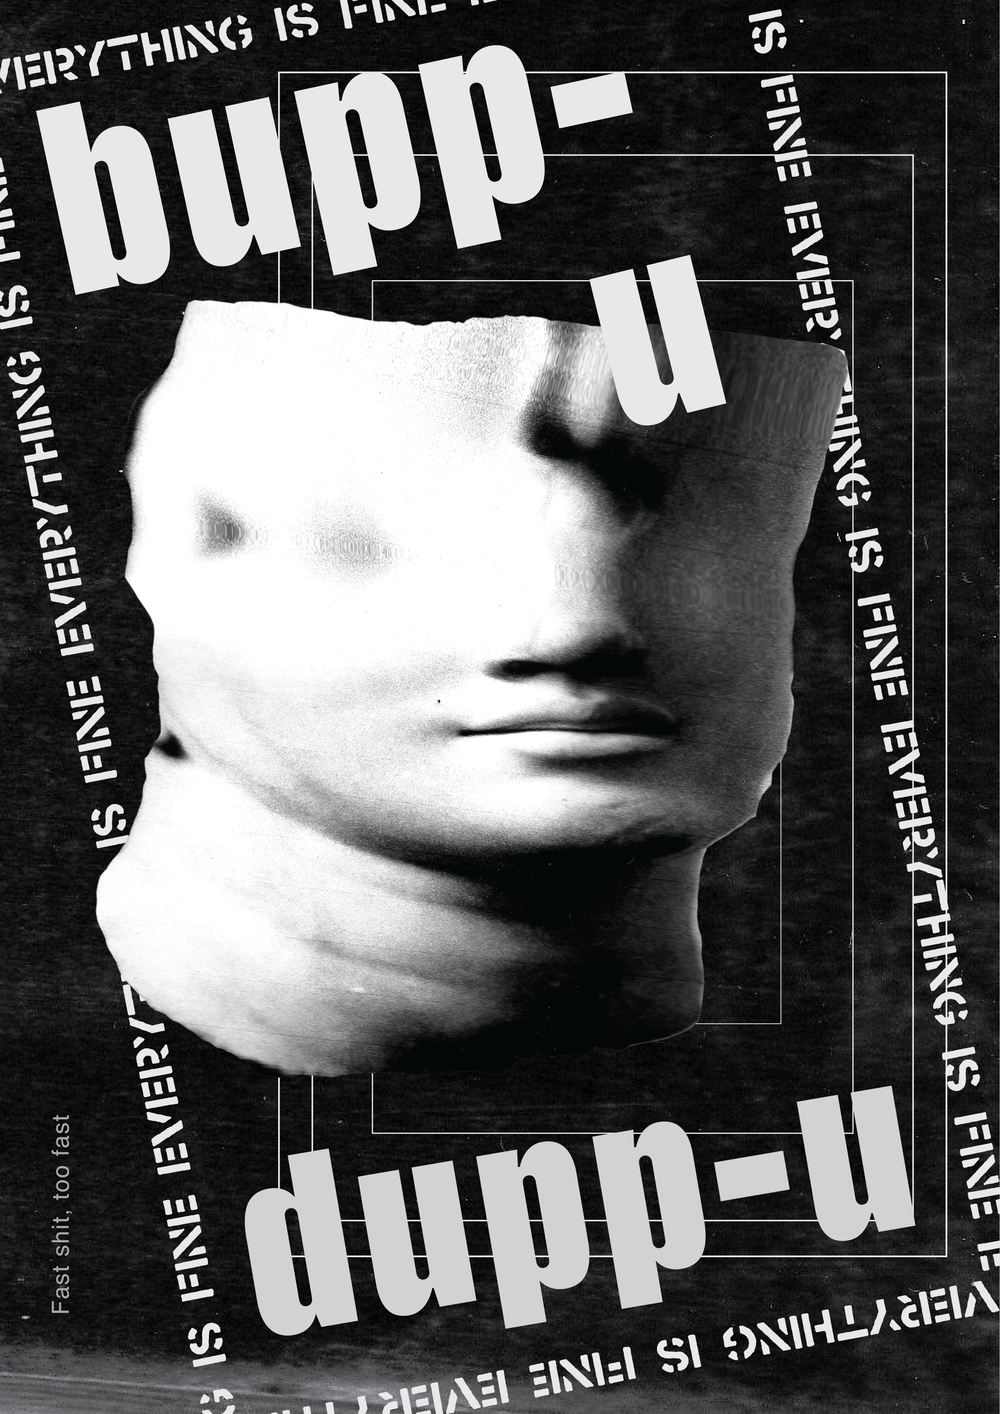 buppuduppu-01.png